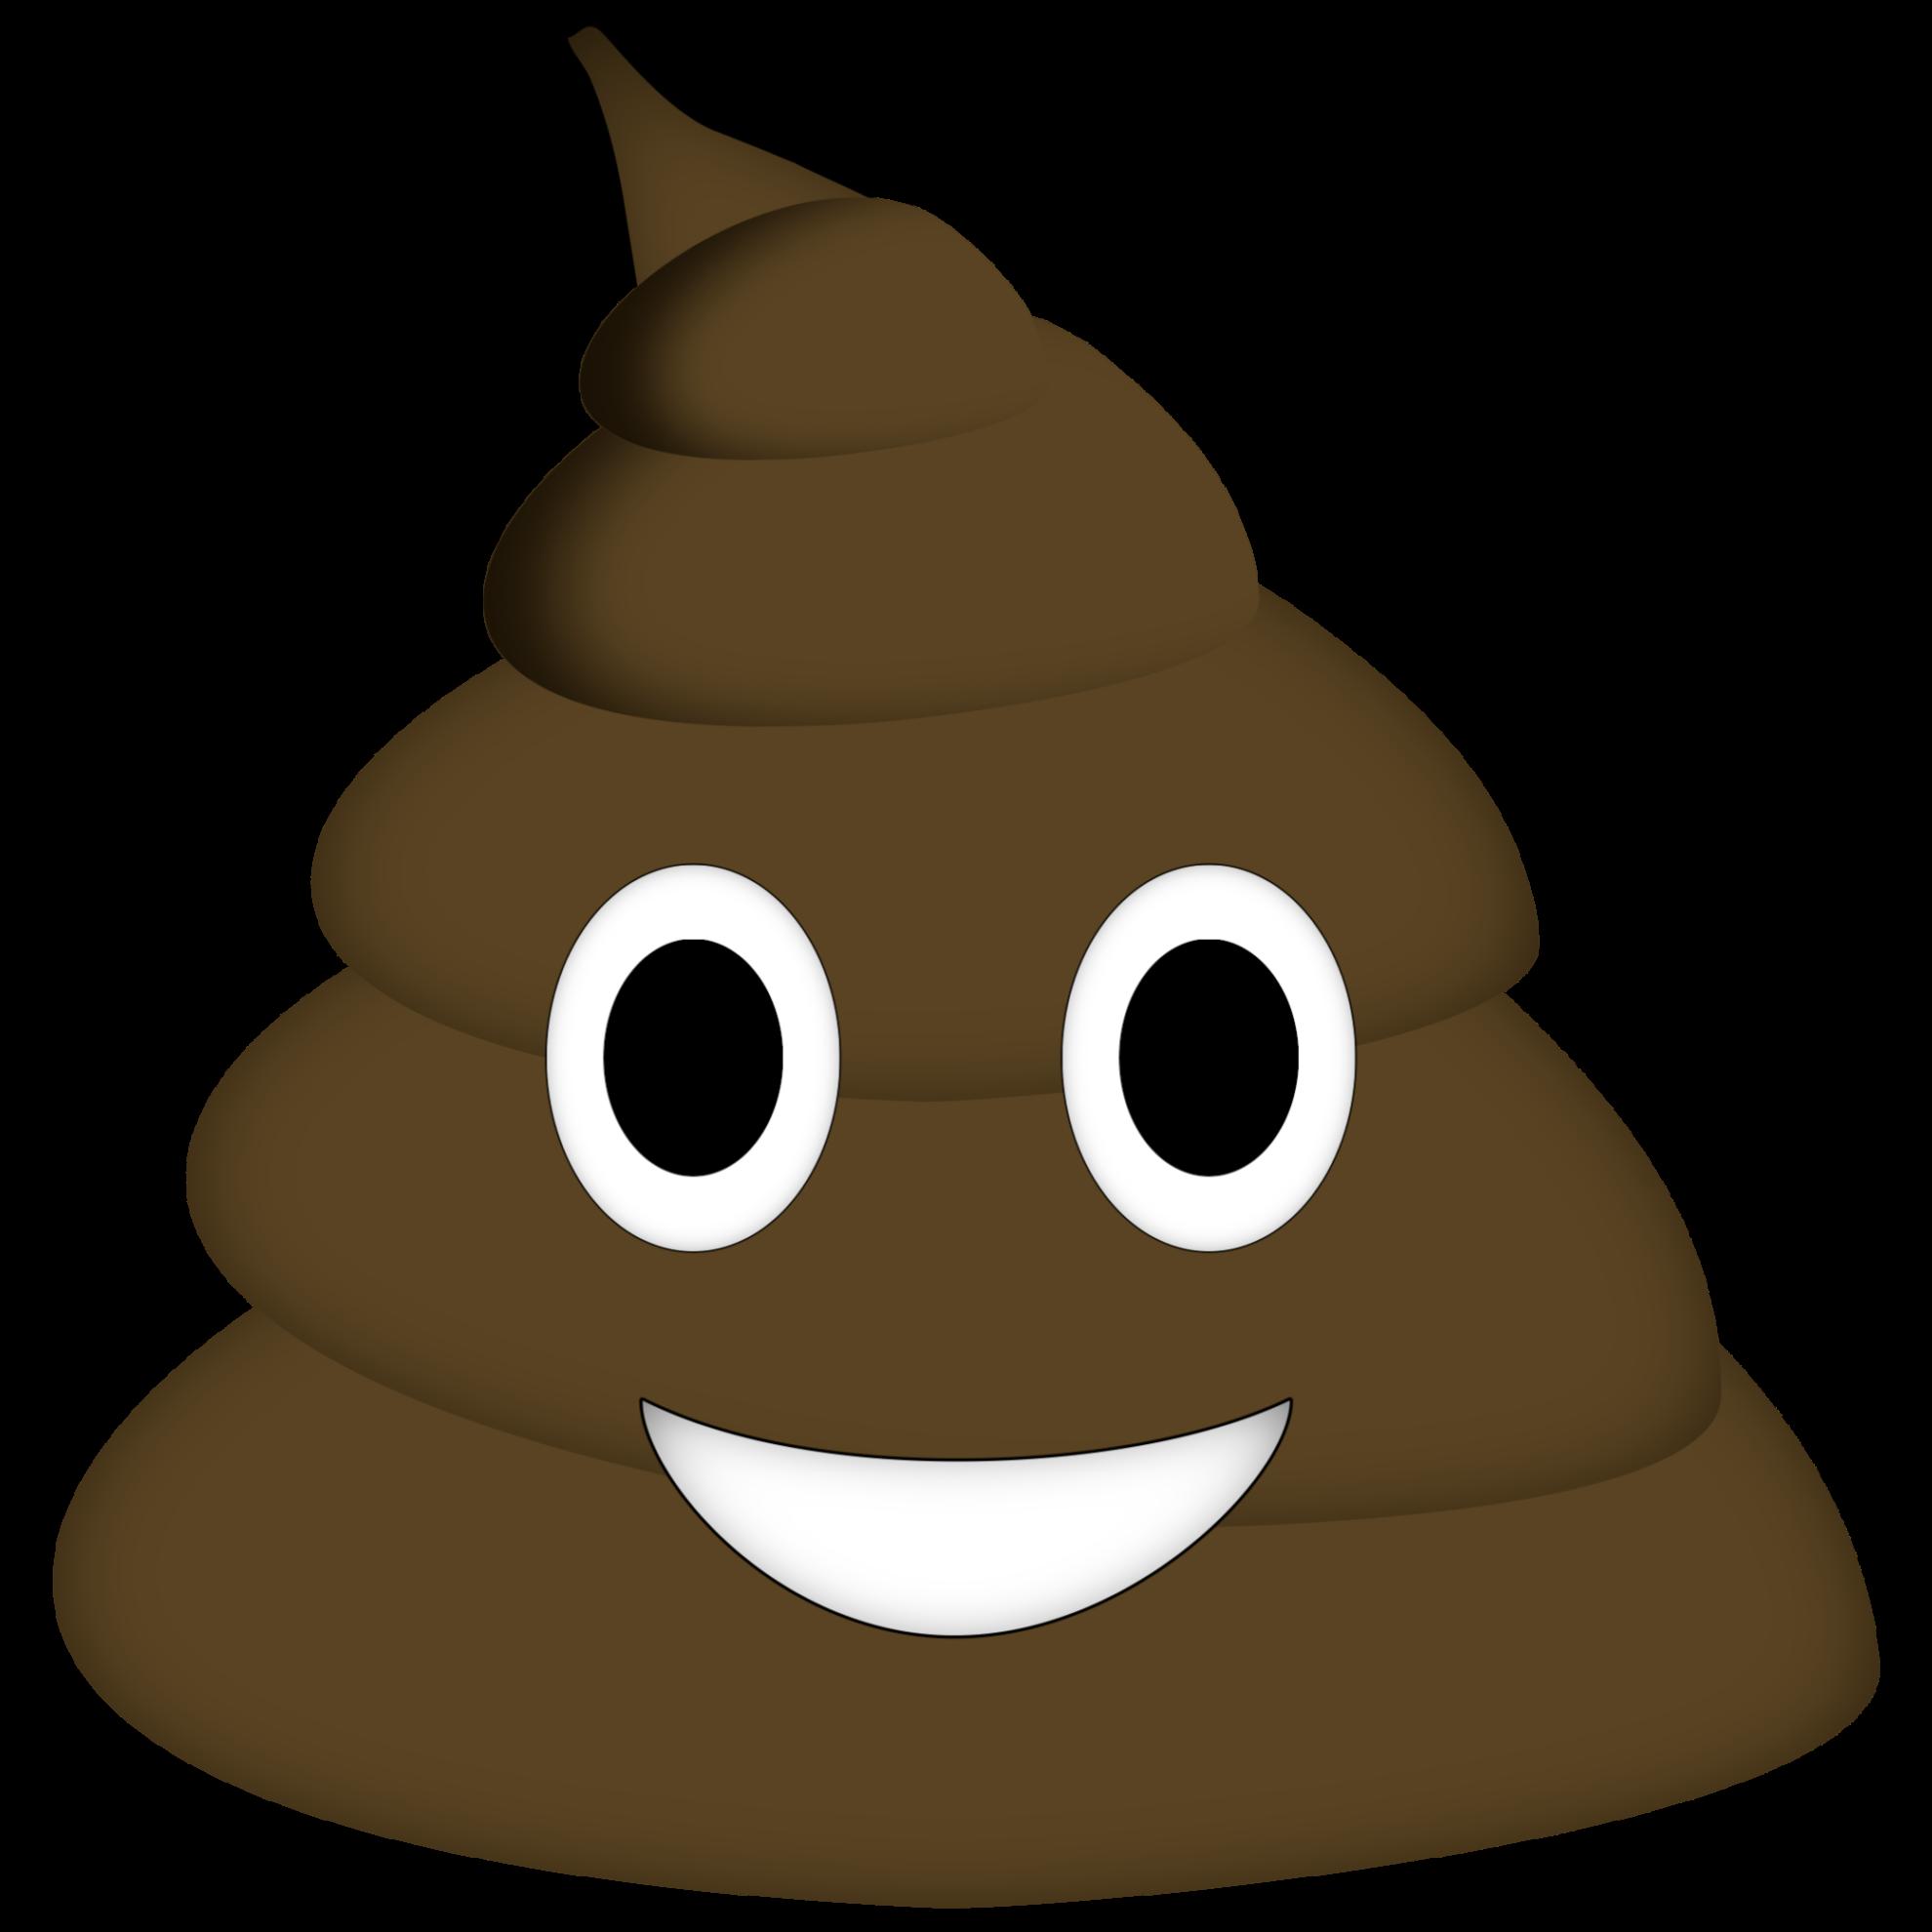 graphic regarding Printable Emoticons Free called Emoji Faces Printable No cost Emoji Printables - Paper Path